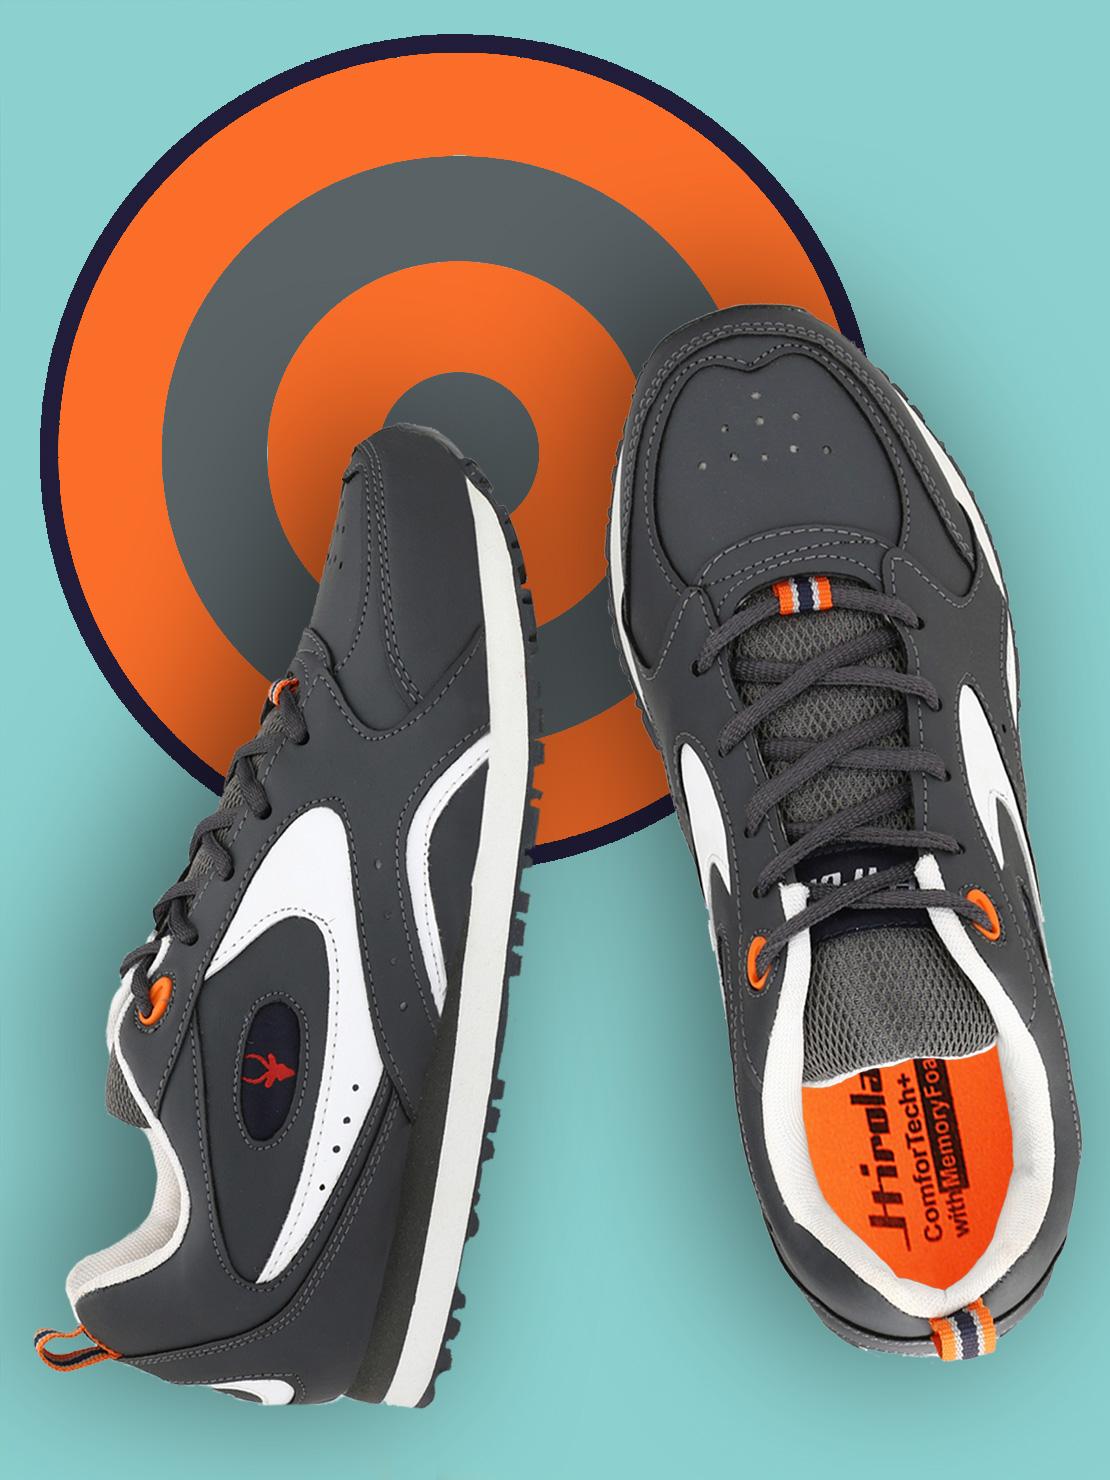 Hirolas   Hirolas Multi Sport Shock Absorbing Walking  Running Fitness Athletic Training Gym Sneaker Shoes - Grey